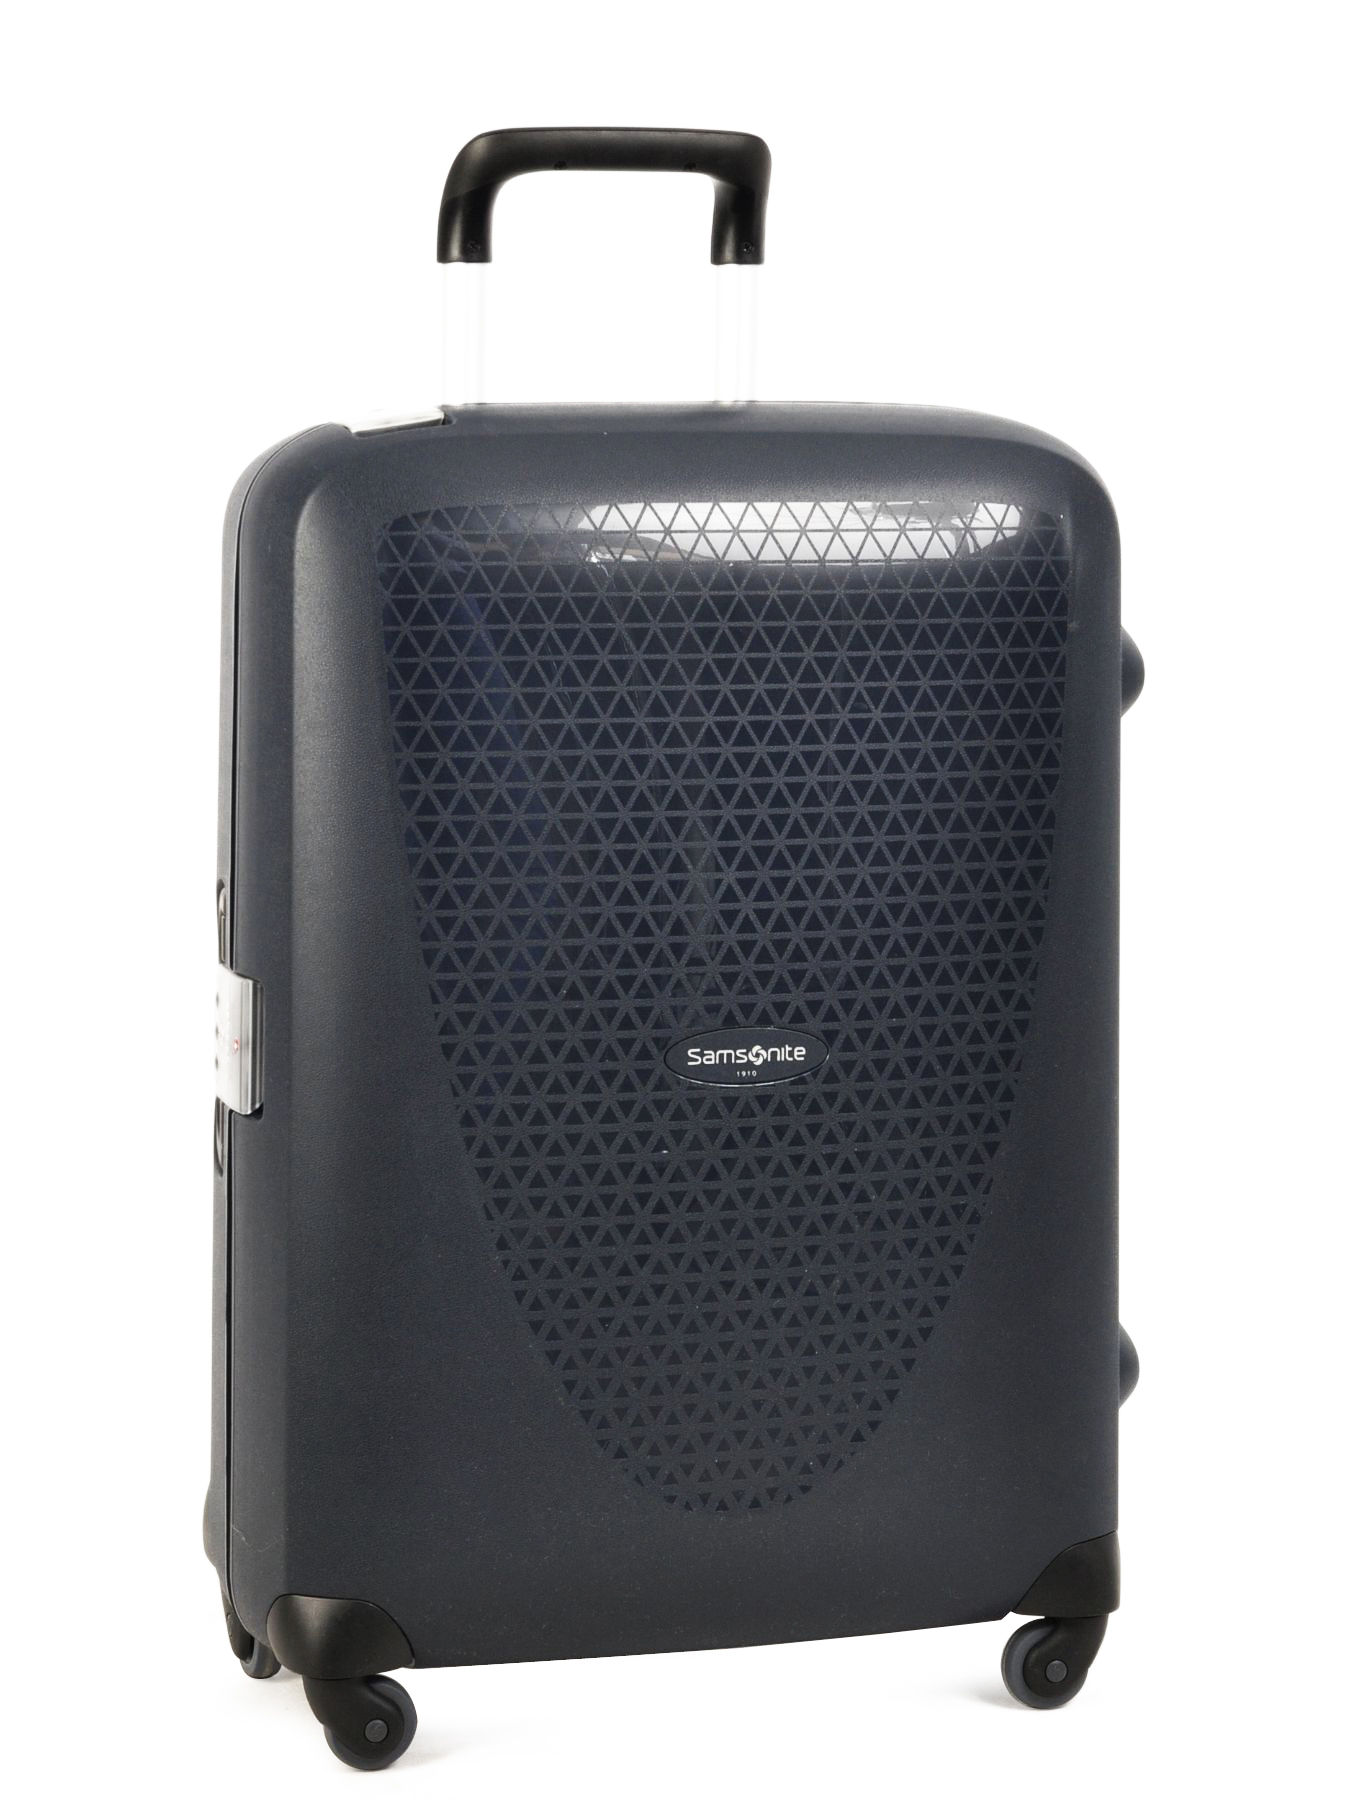 valise 4 roues rigide samsonite bleu termo young 70u004. Black Bedroom Furniture Sets. Home Design Ideas